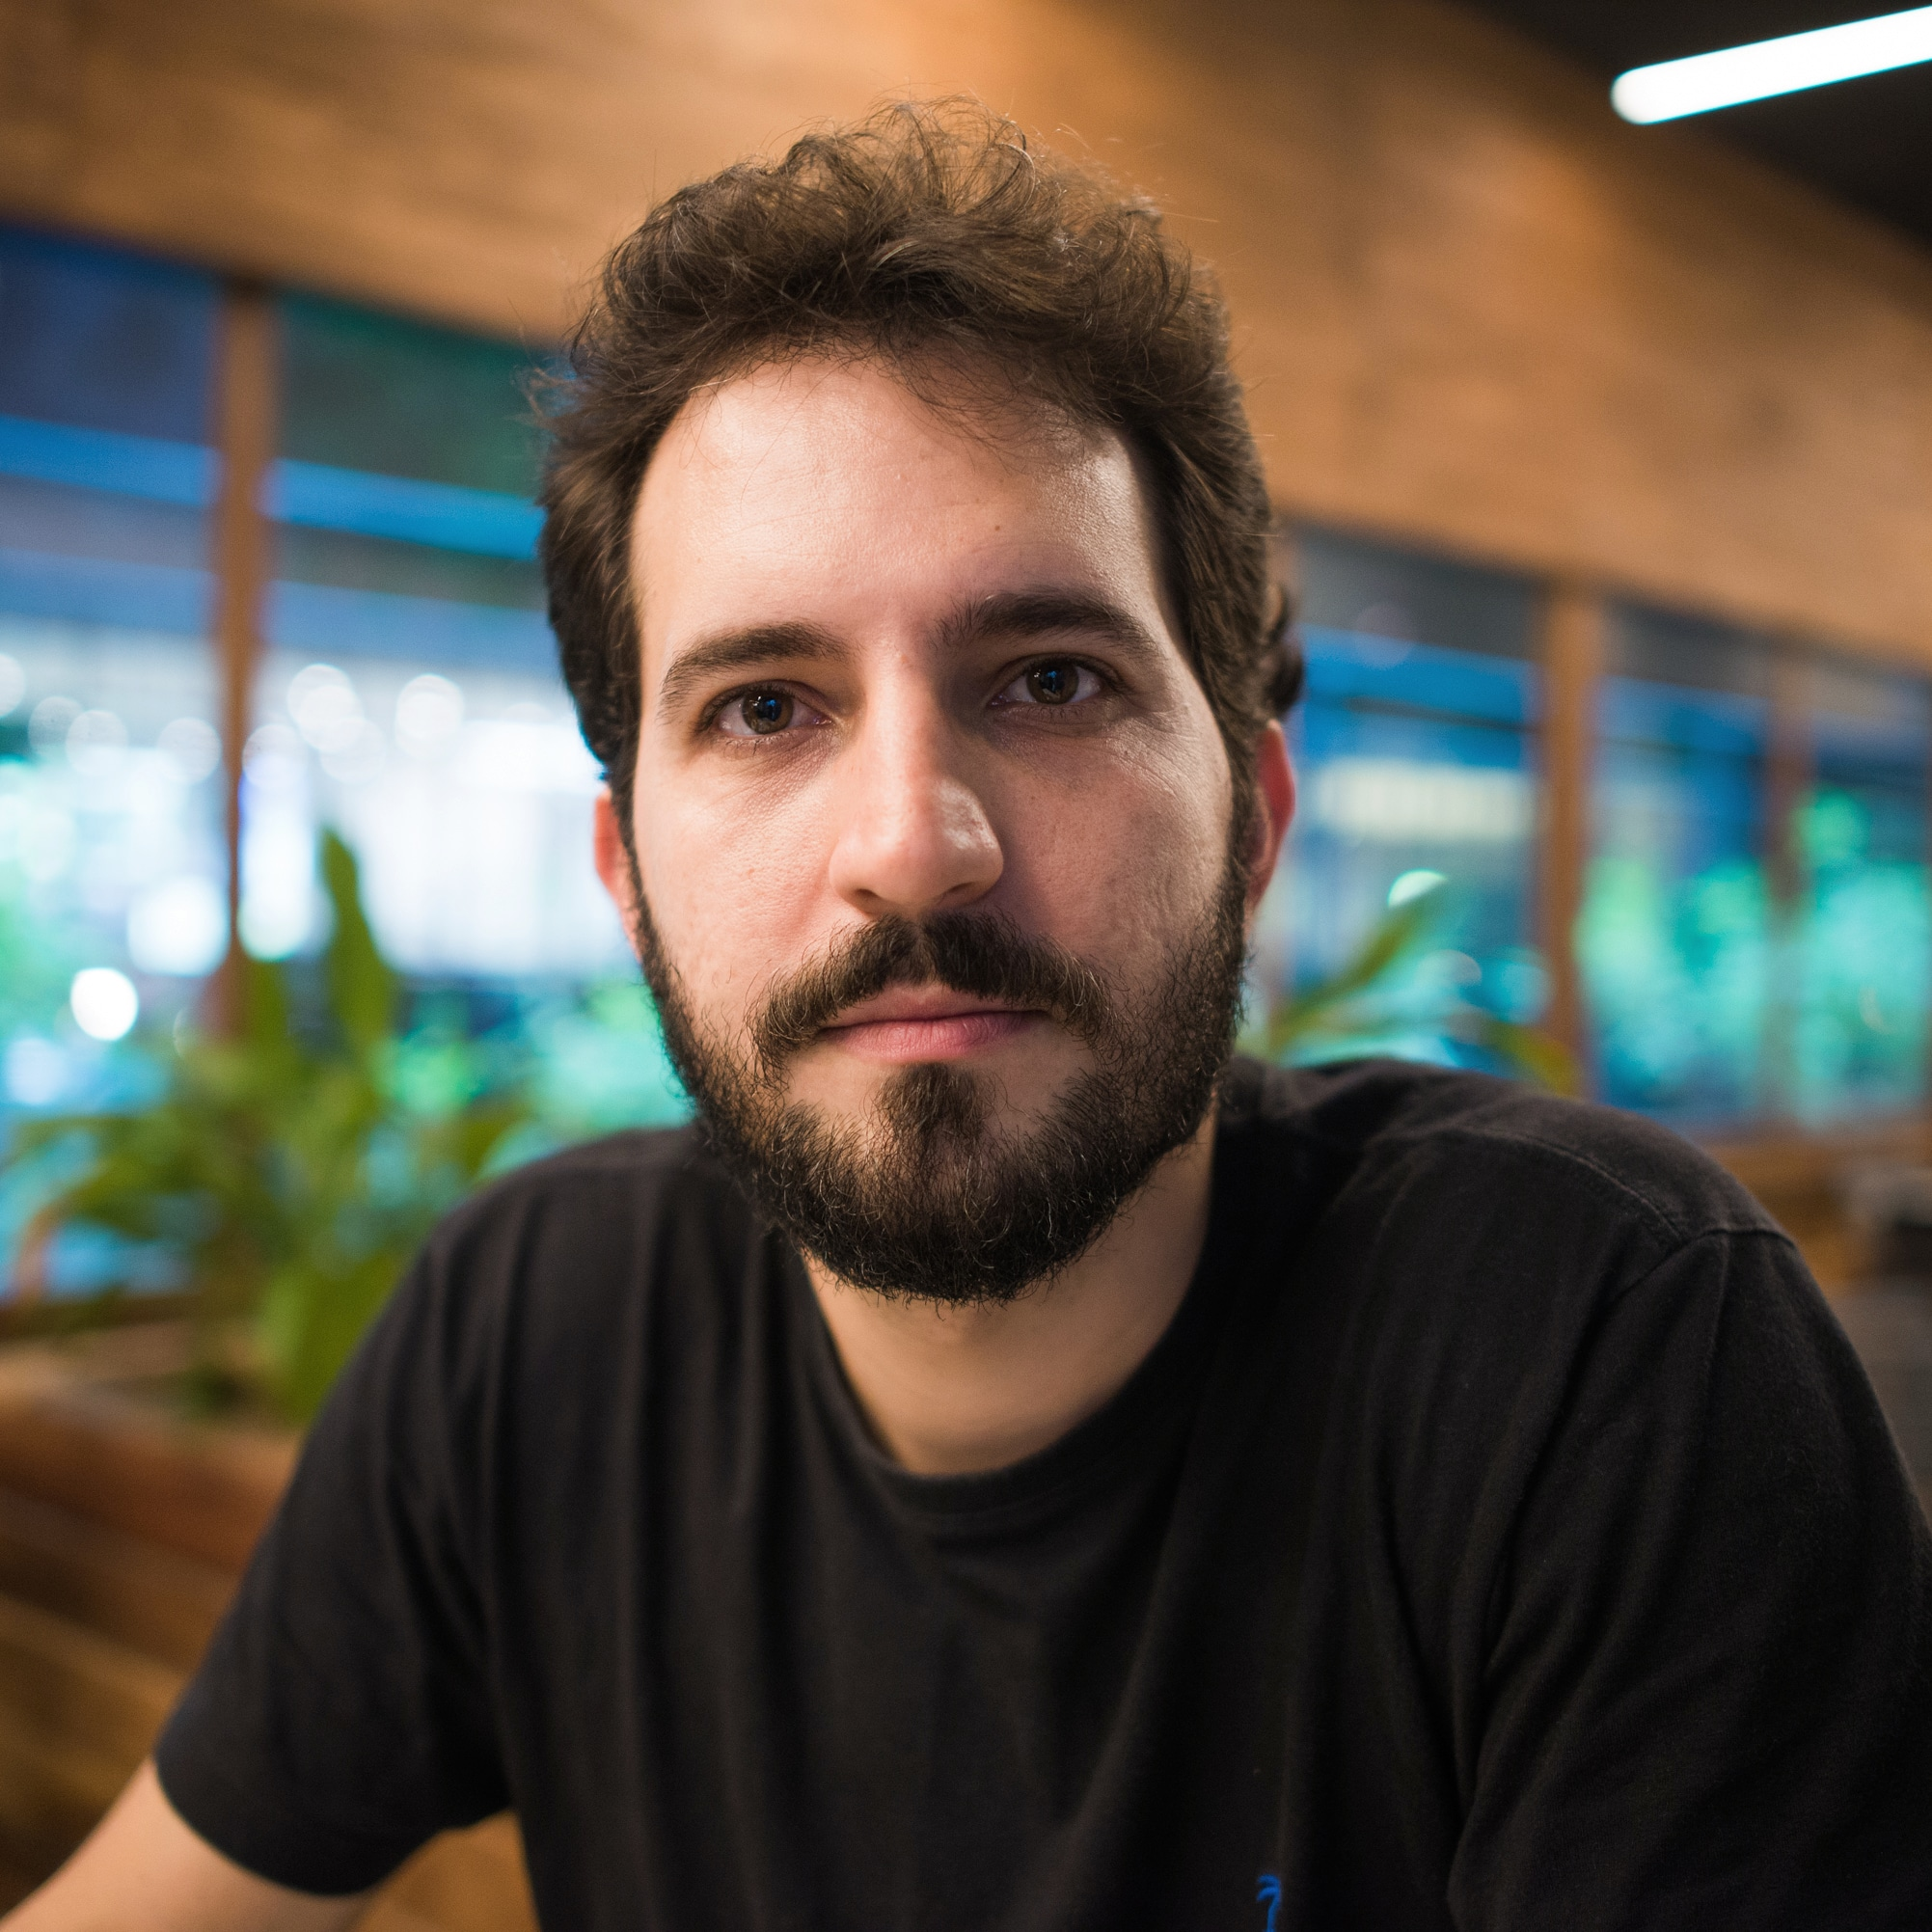 Leonardo Nóbrega da Silva